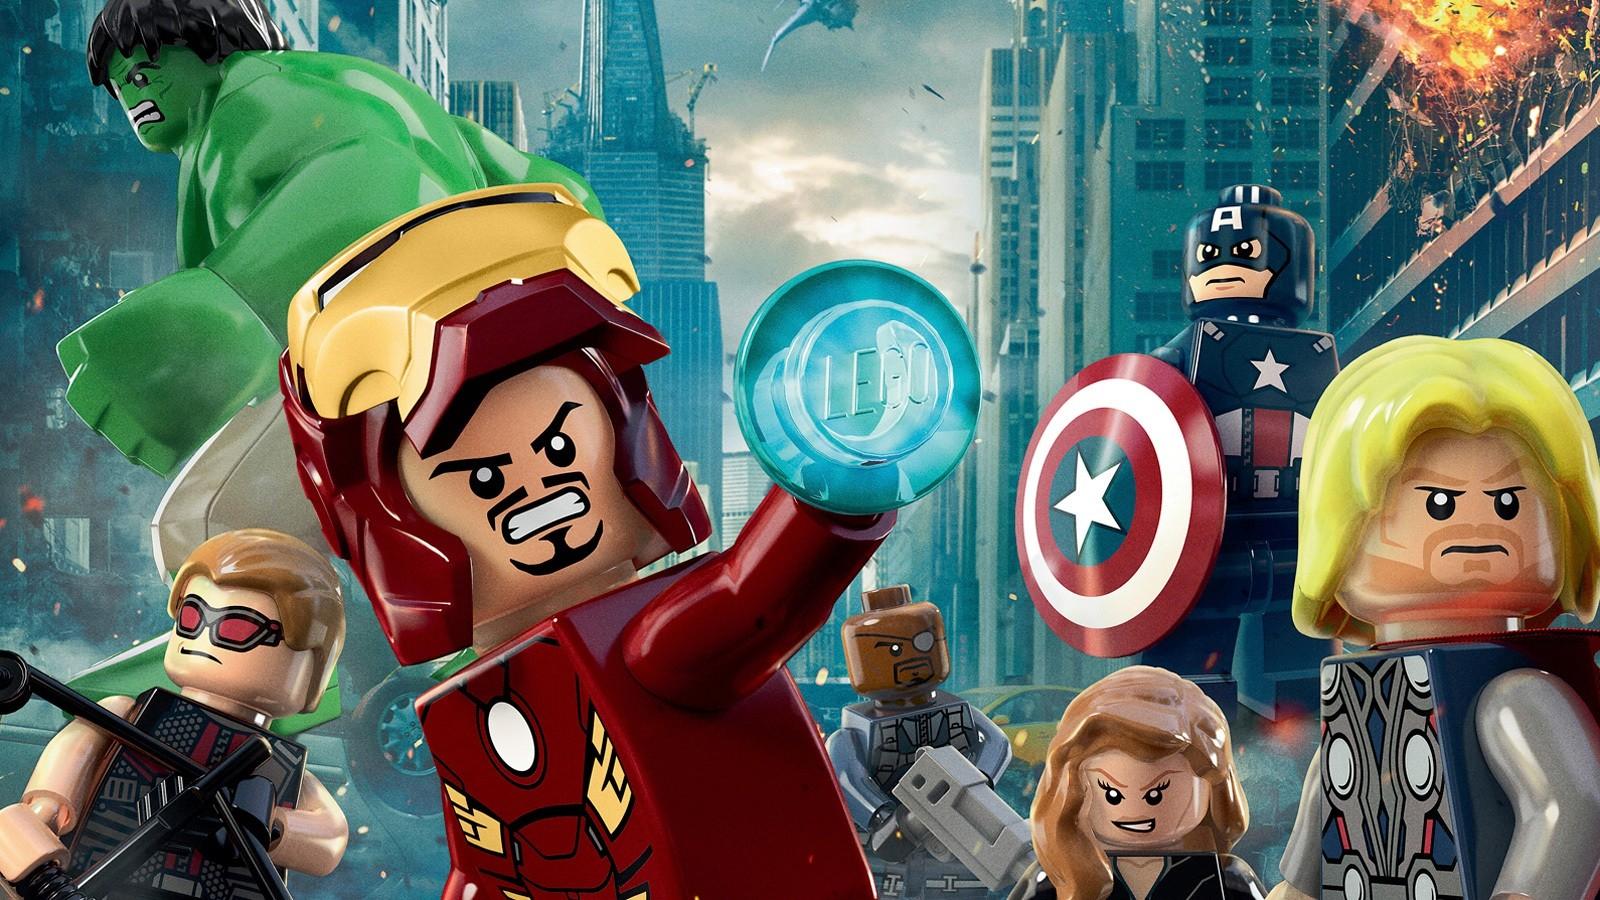 38 Lego Avengers Wallpaper Hd On Wallpapersafari